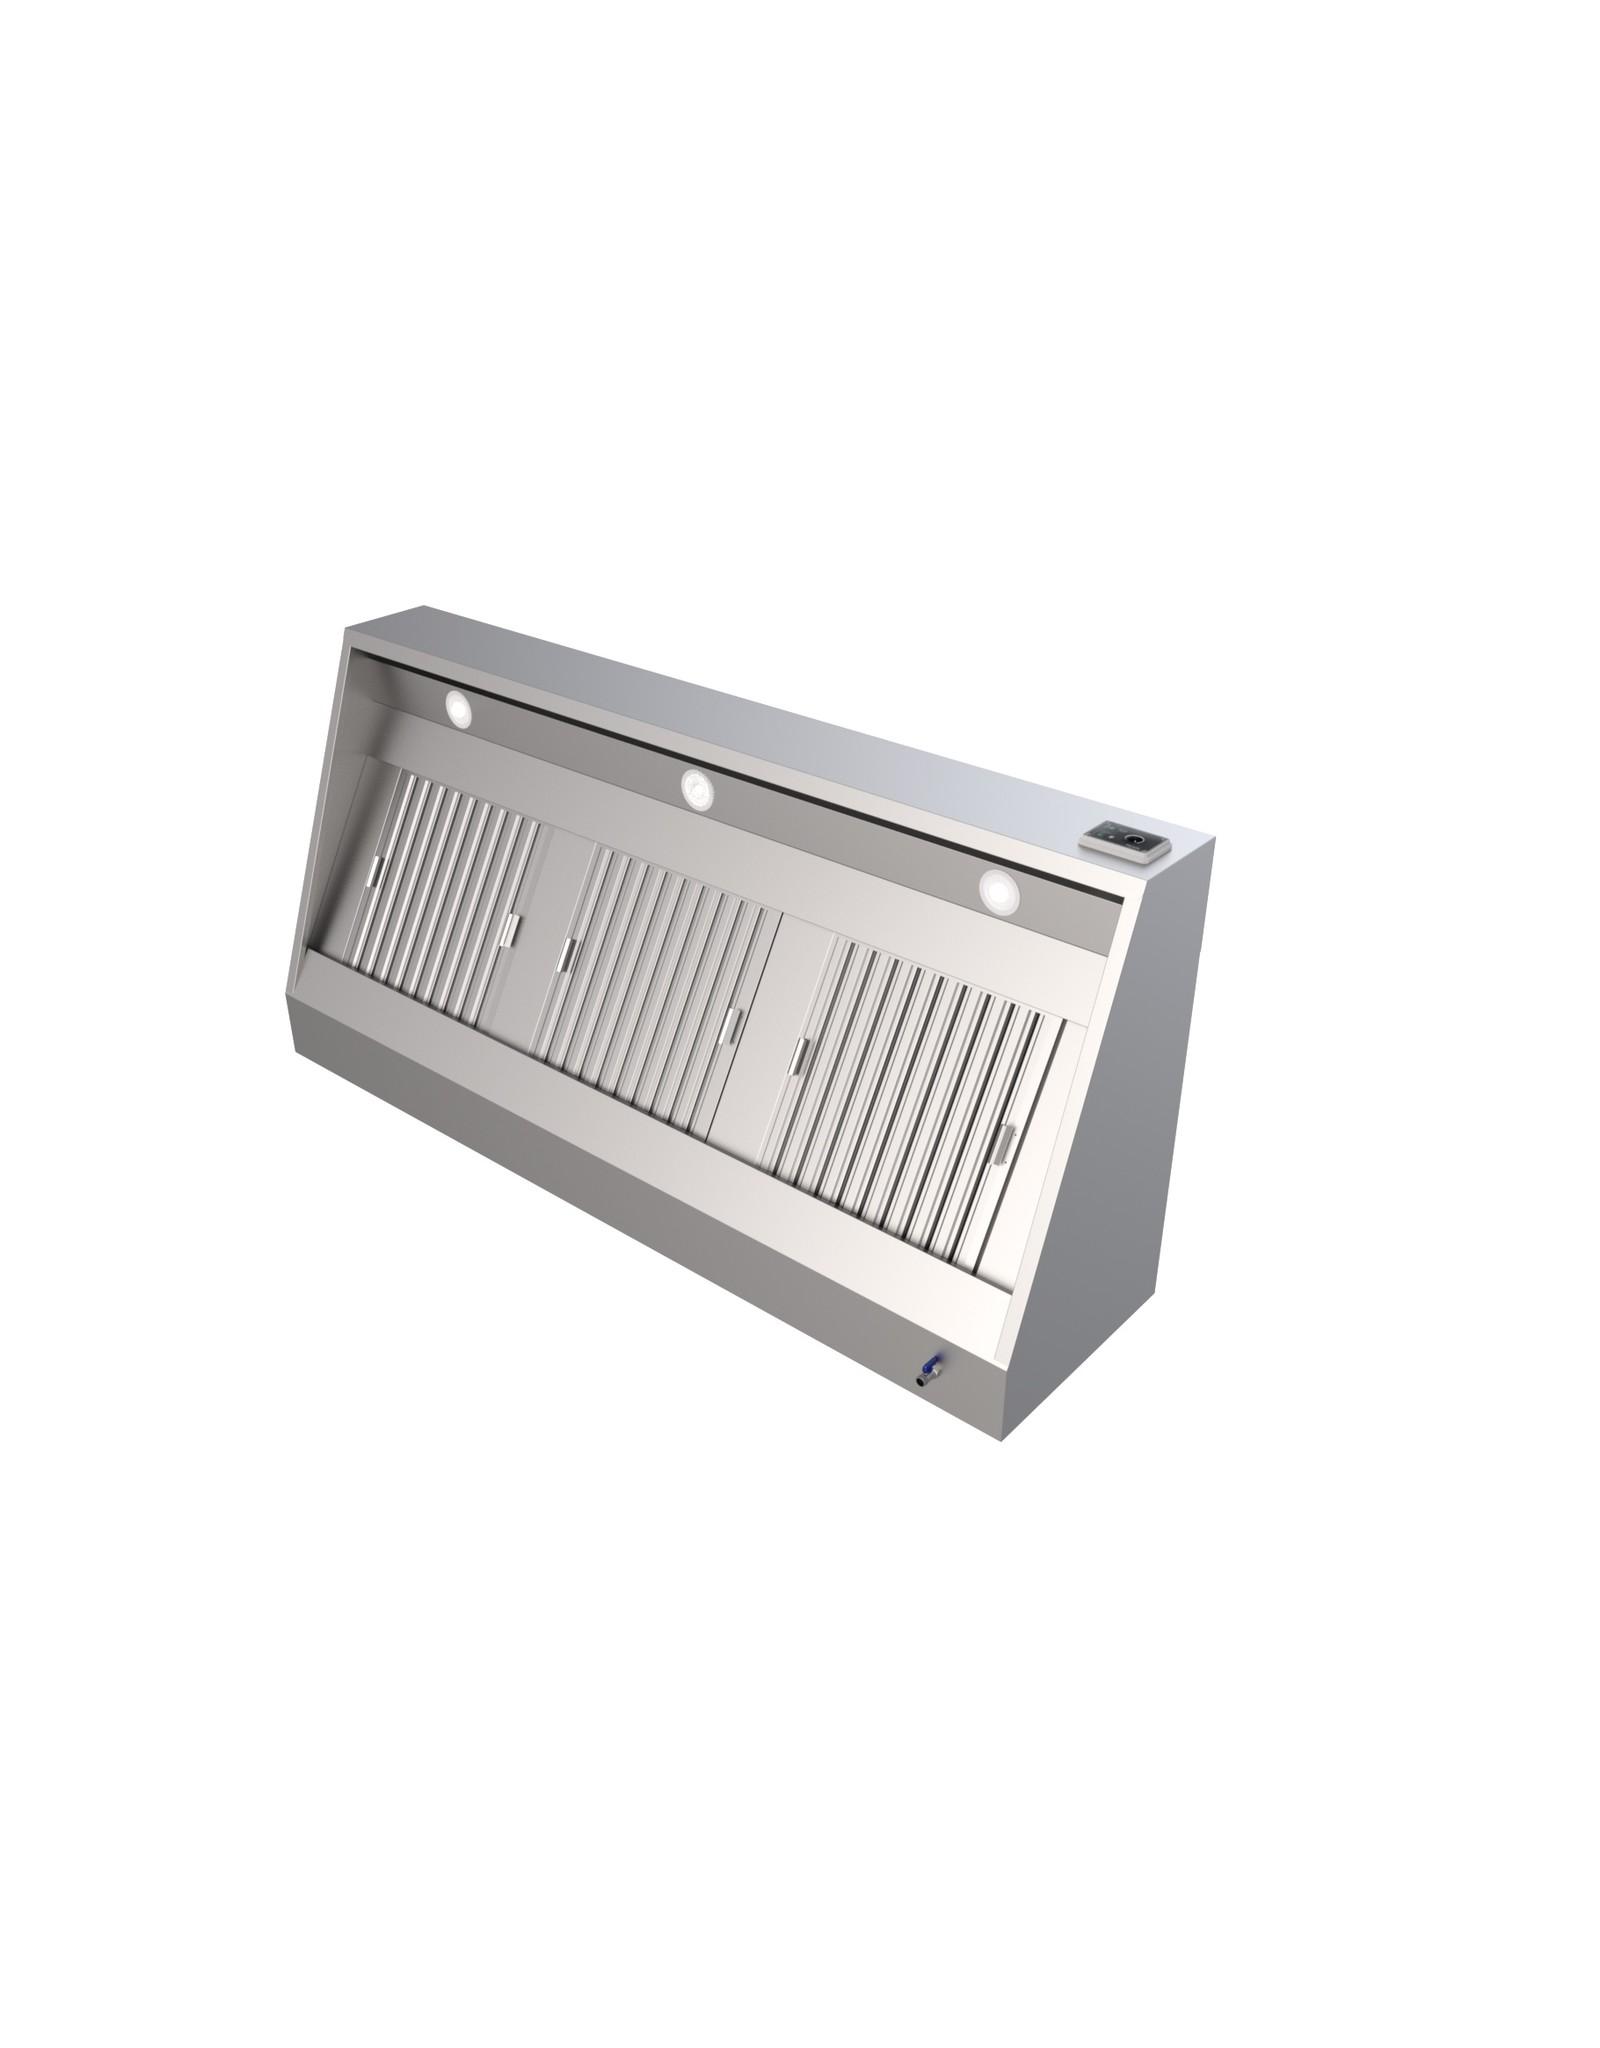 Q-Gastro RVS Afzuigkap NIEUW!! Verlichting+filter 140x70x45